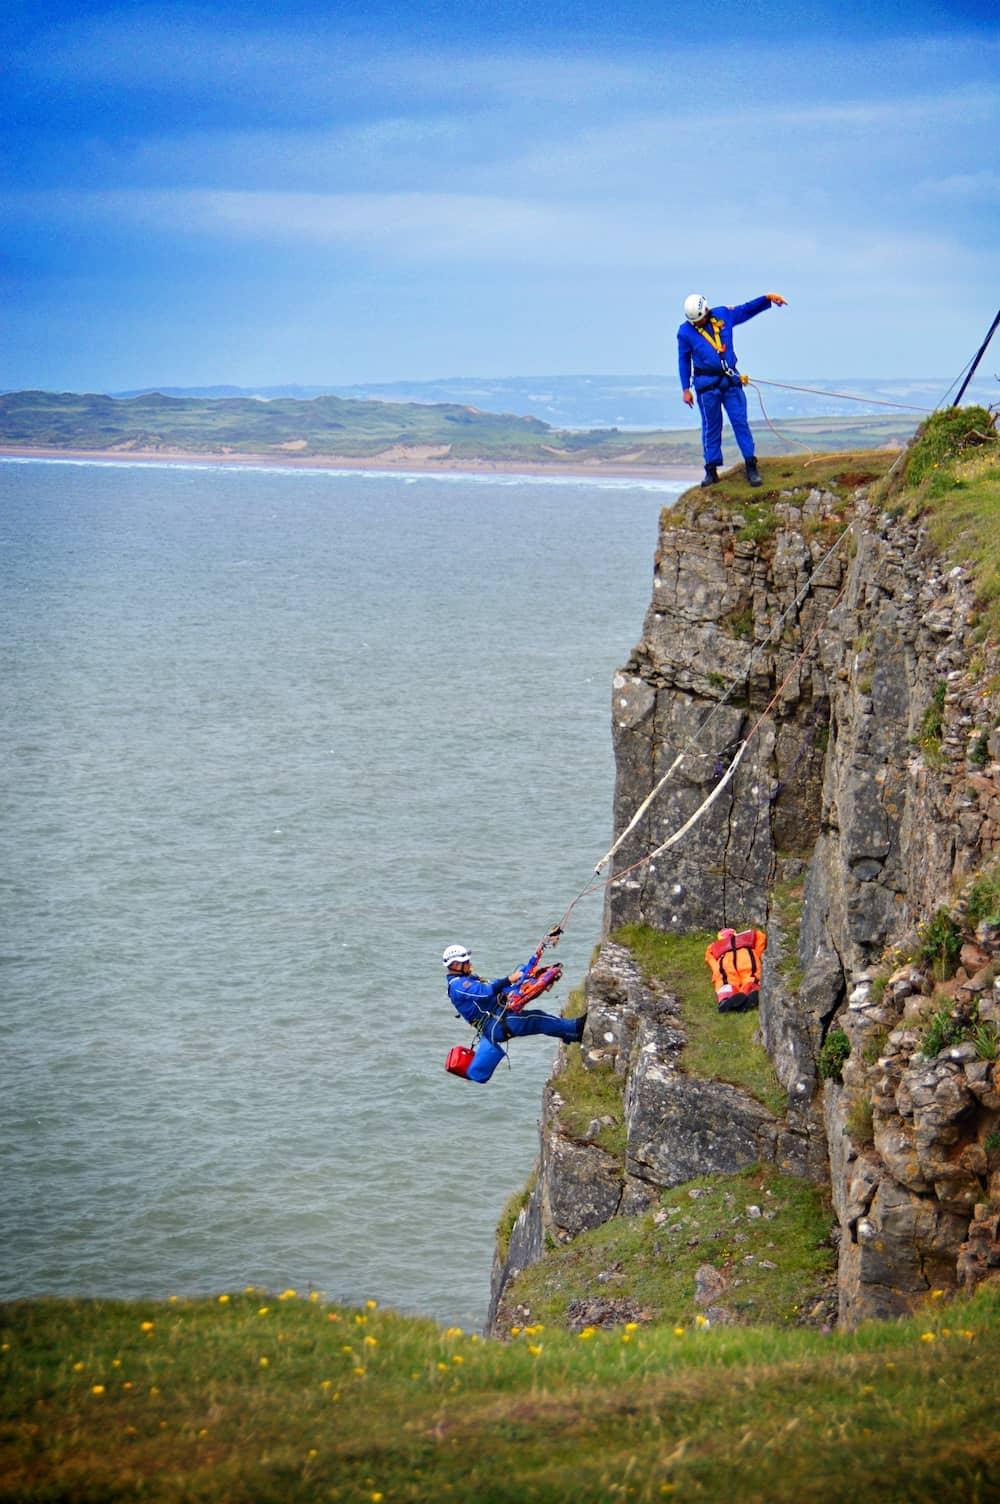 Coast guard rescue training exercise YXJH7LS (1)